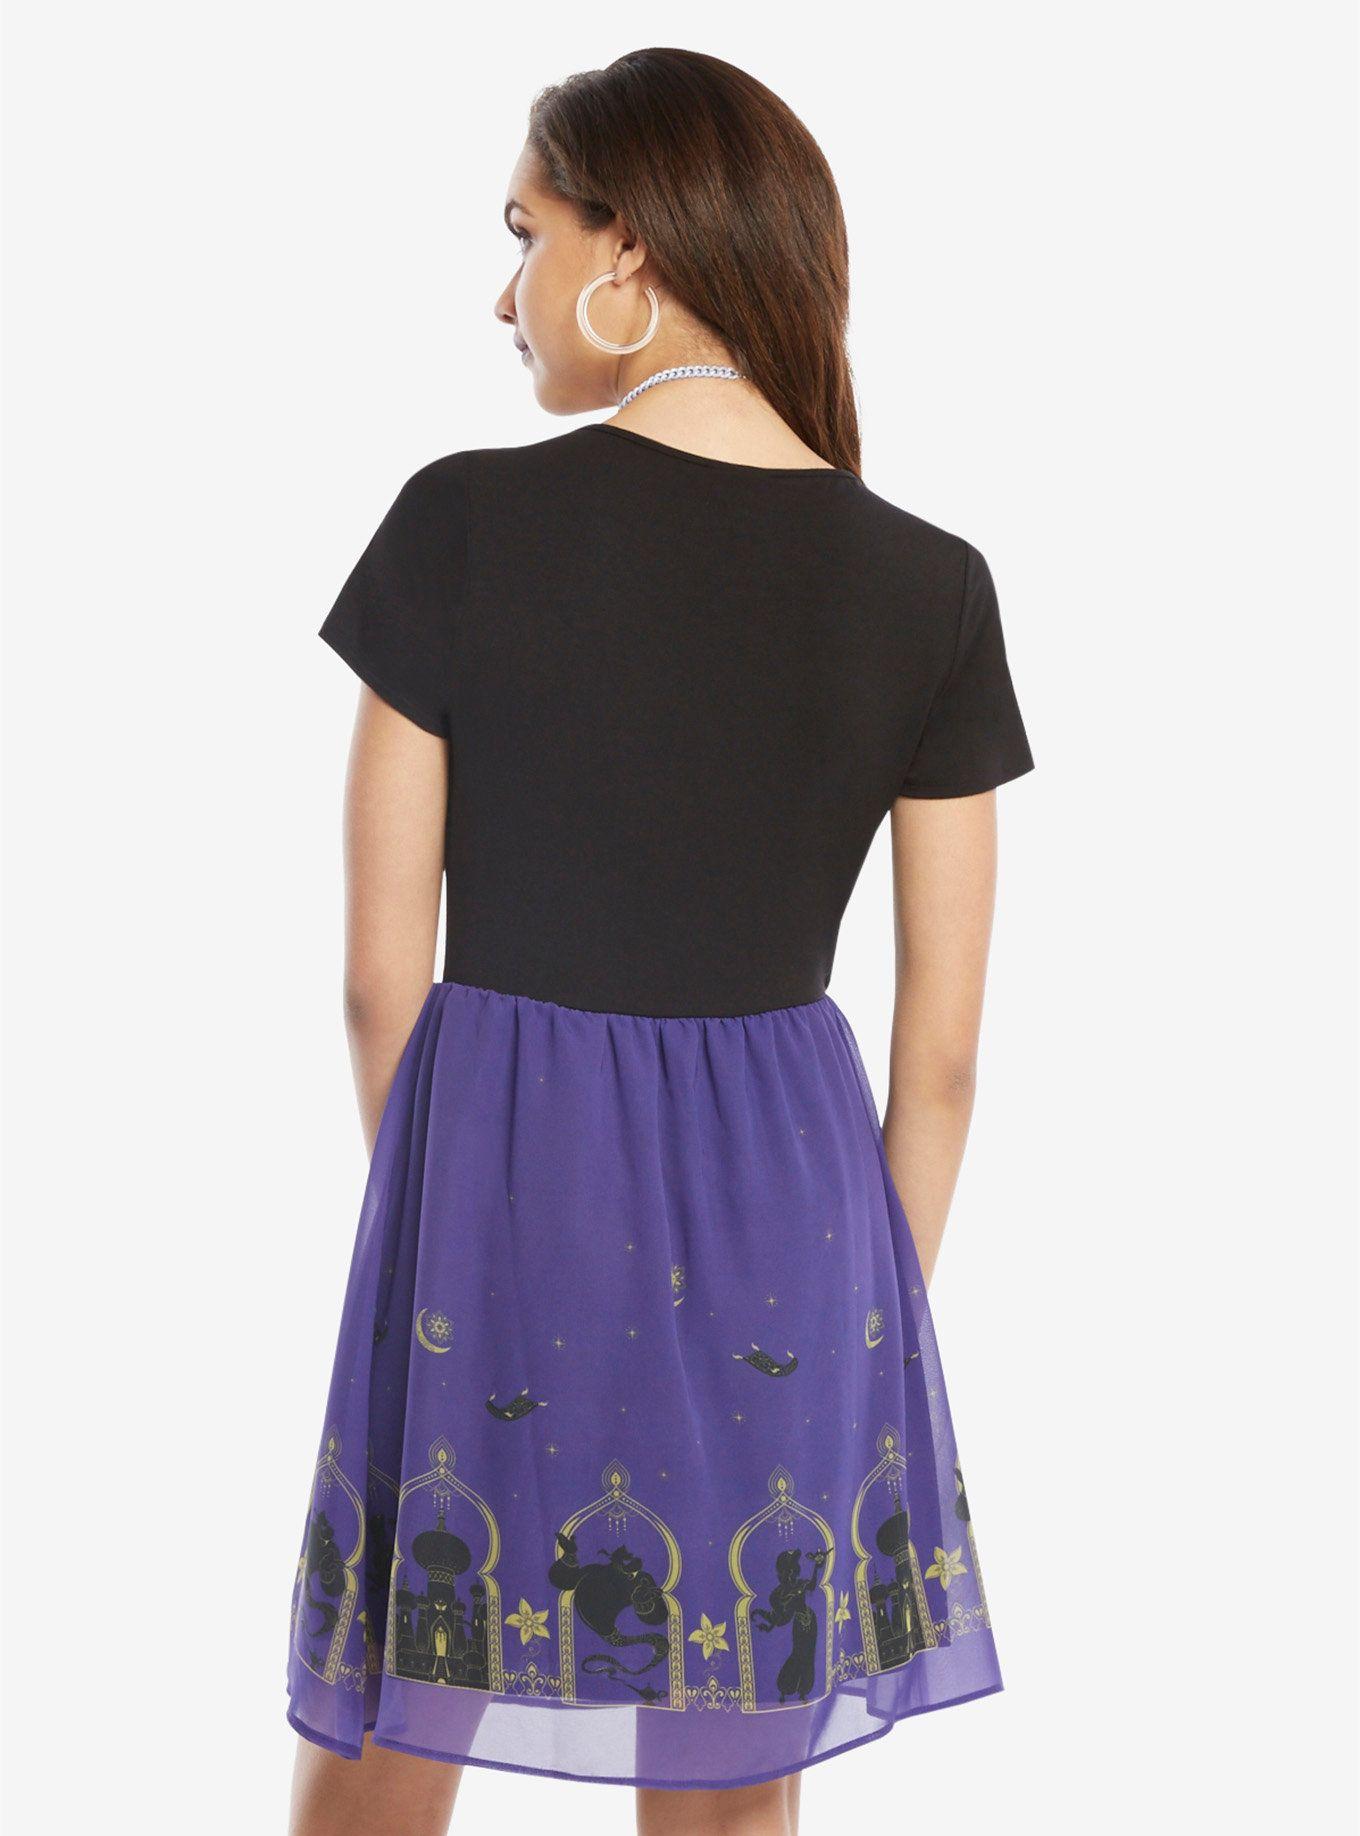 639baefc7 Disney Aladdin Border Print Dress, | My wardrobe | Dresses, Chiffon ...